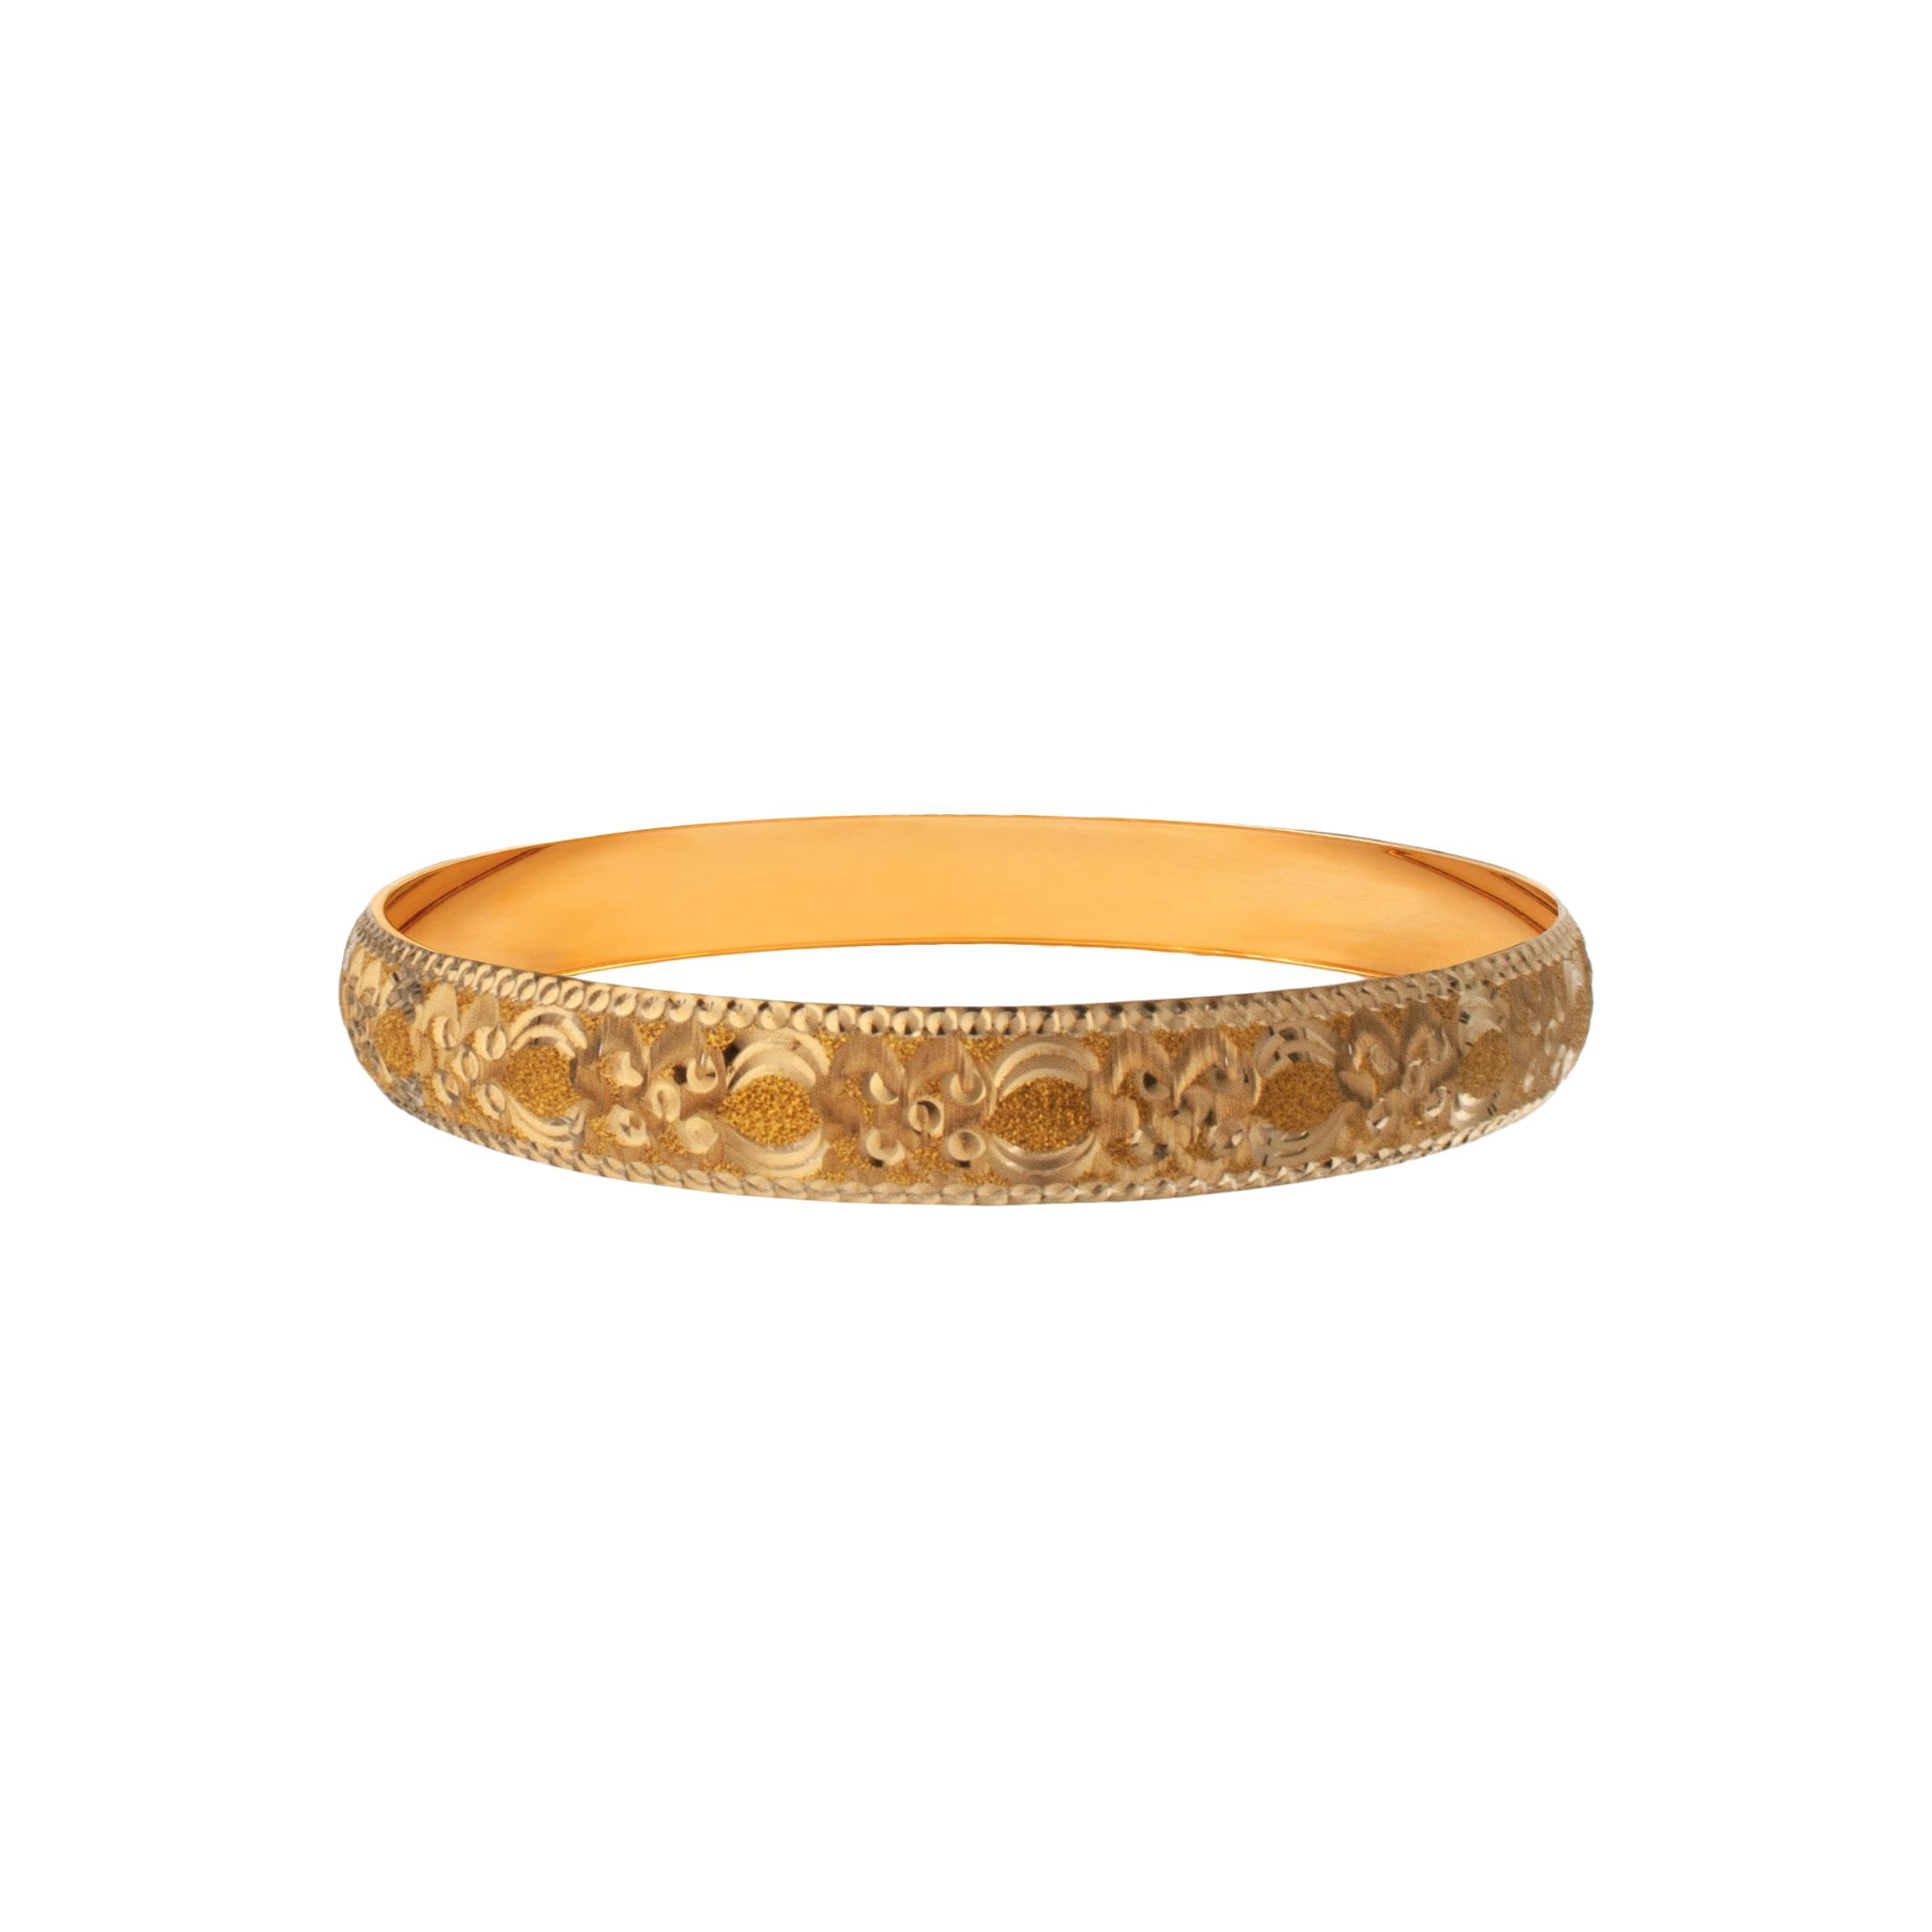 النگو طلا ۱۸ عیار زنانه دُرج مدل VB02-4